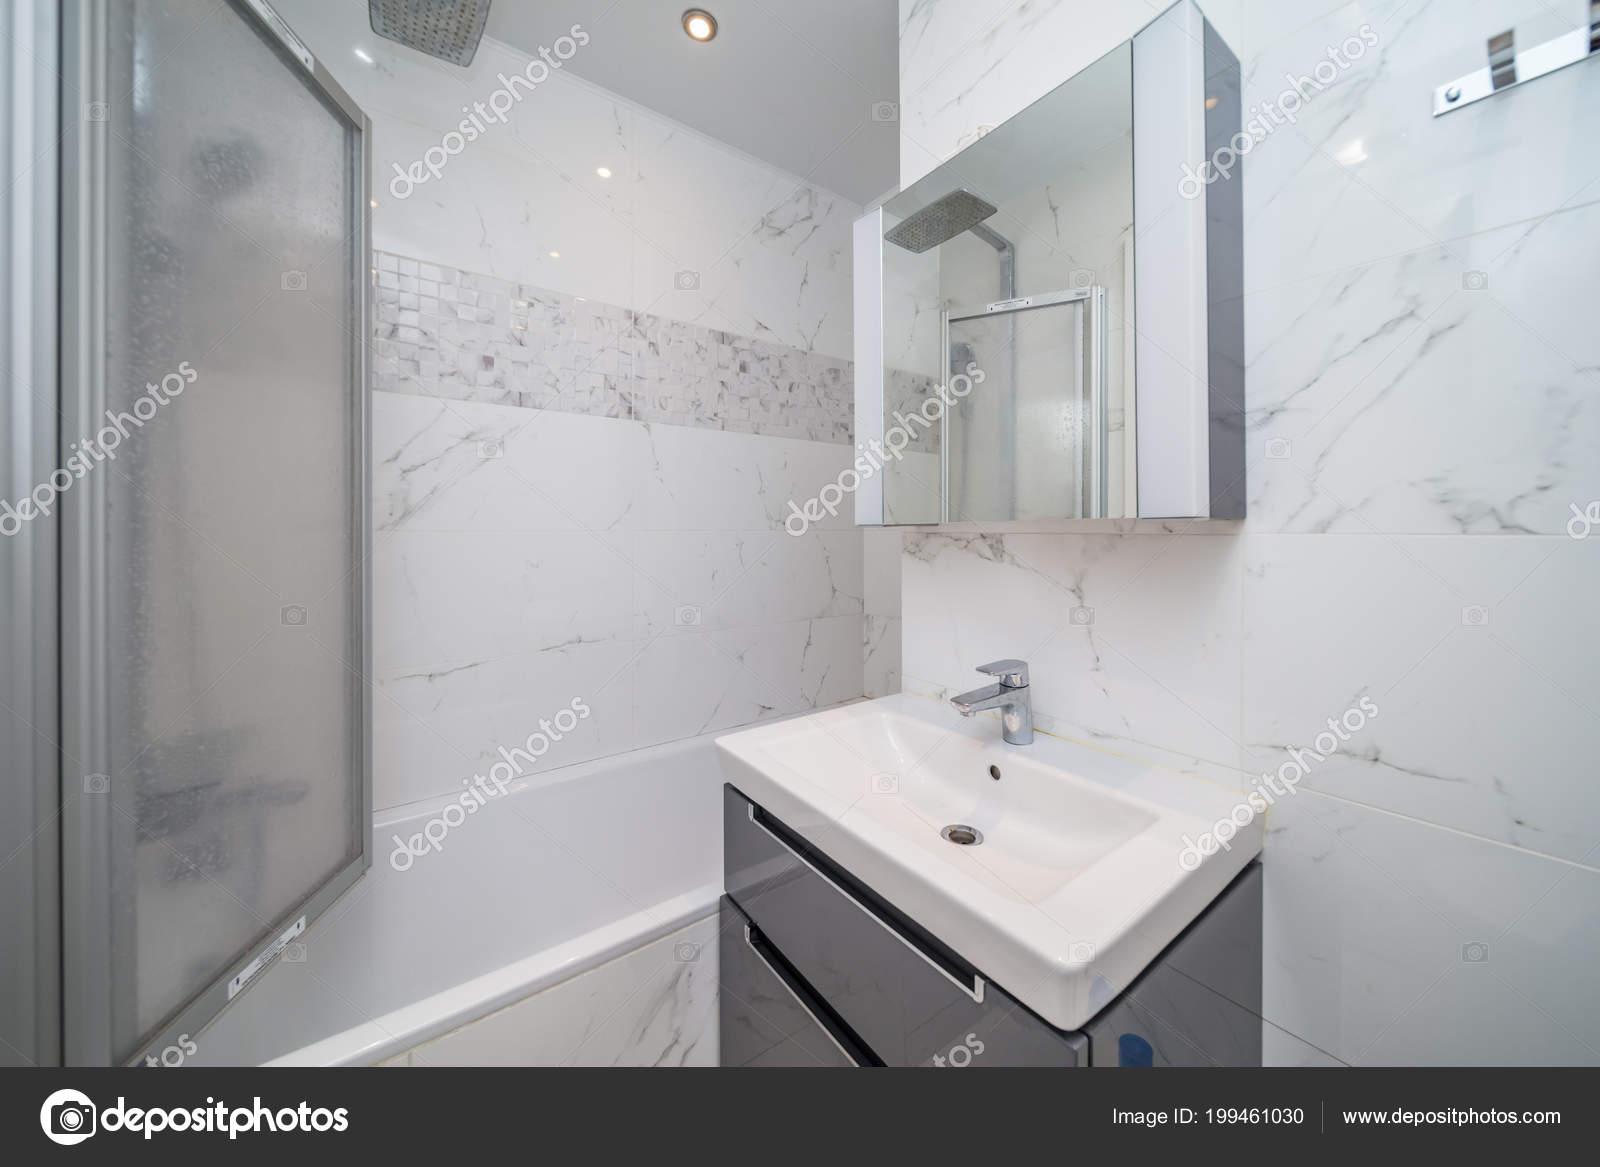 carrelage beige petite salle bains avec baignoire lavabo photographie olgasweet 199461030. Black Bedroom Furniture Sets. Home Design Ideas